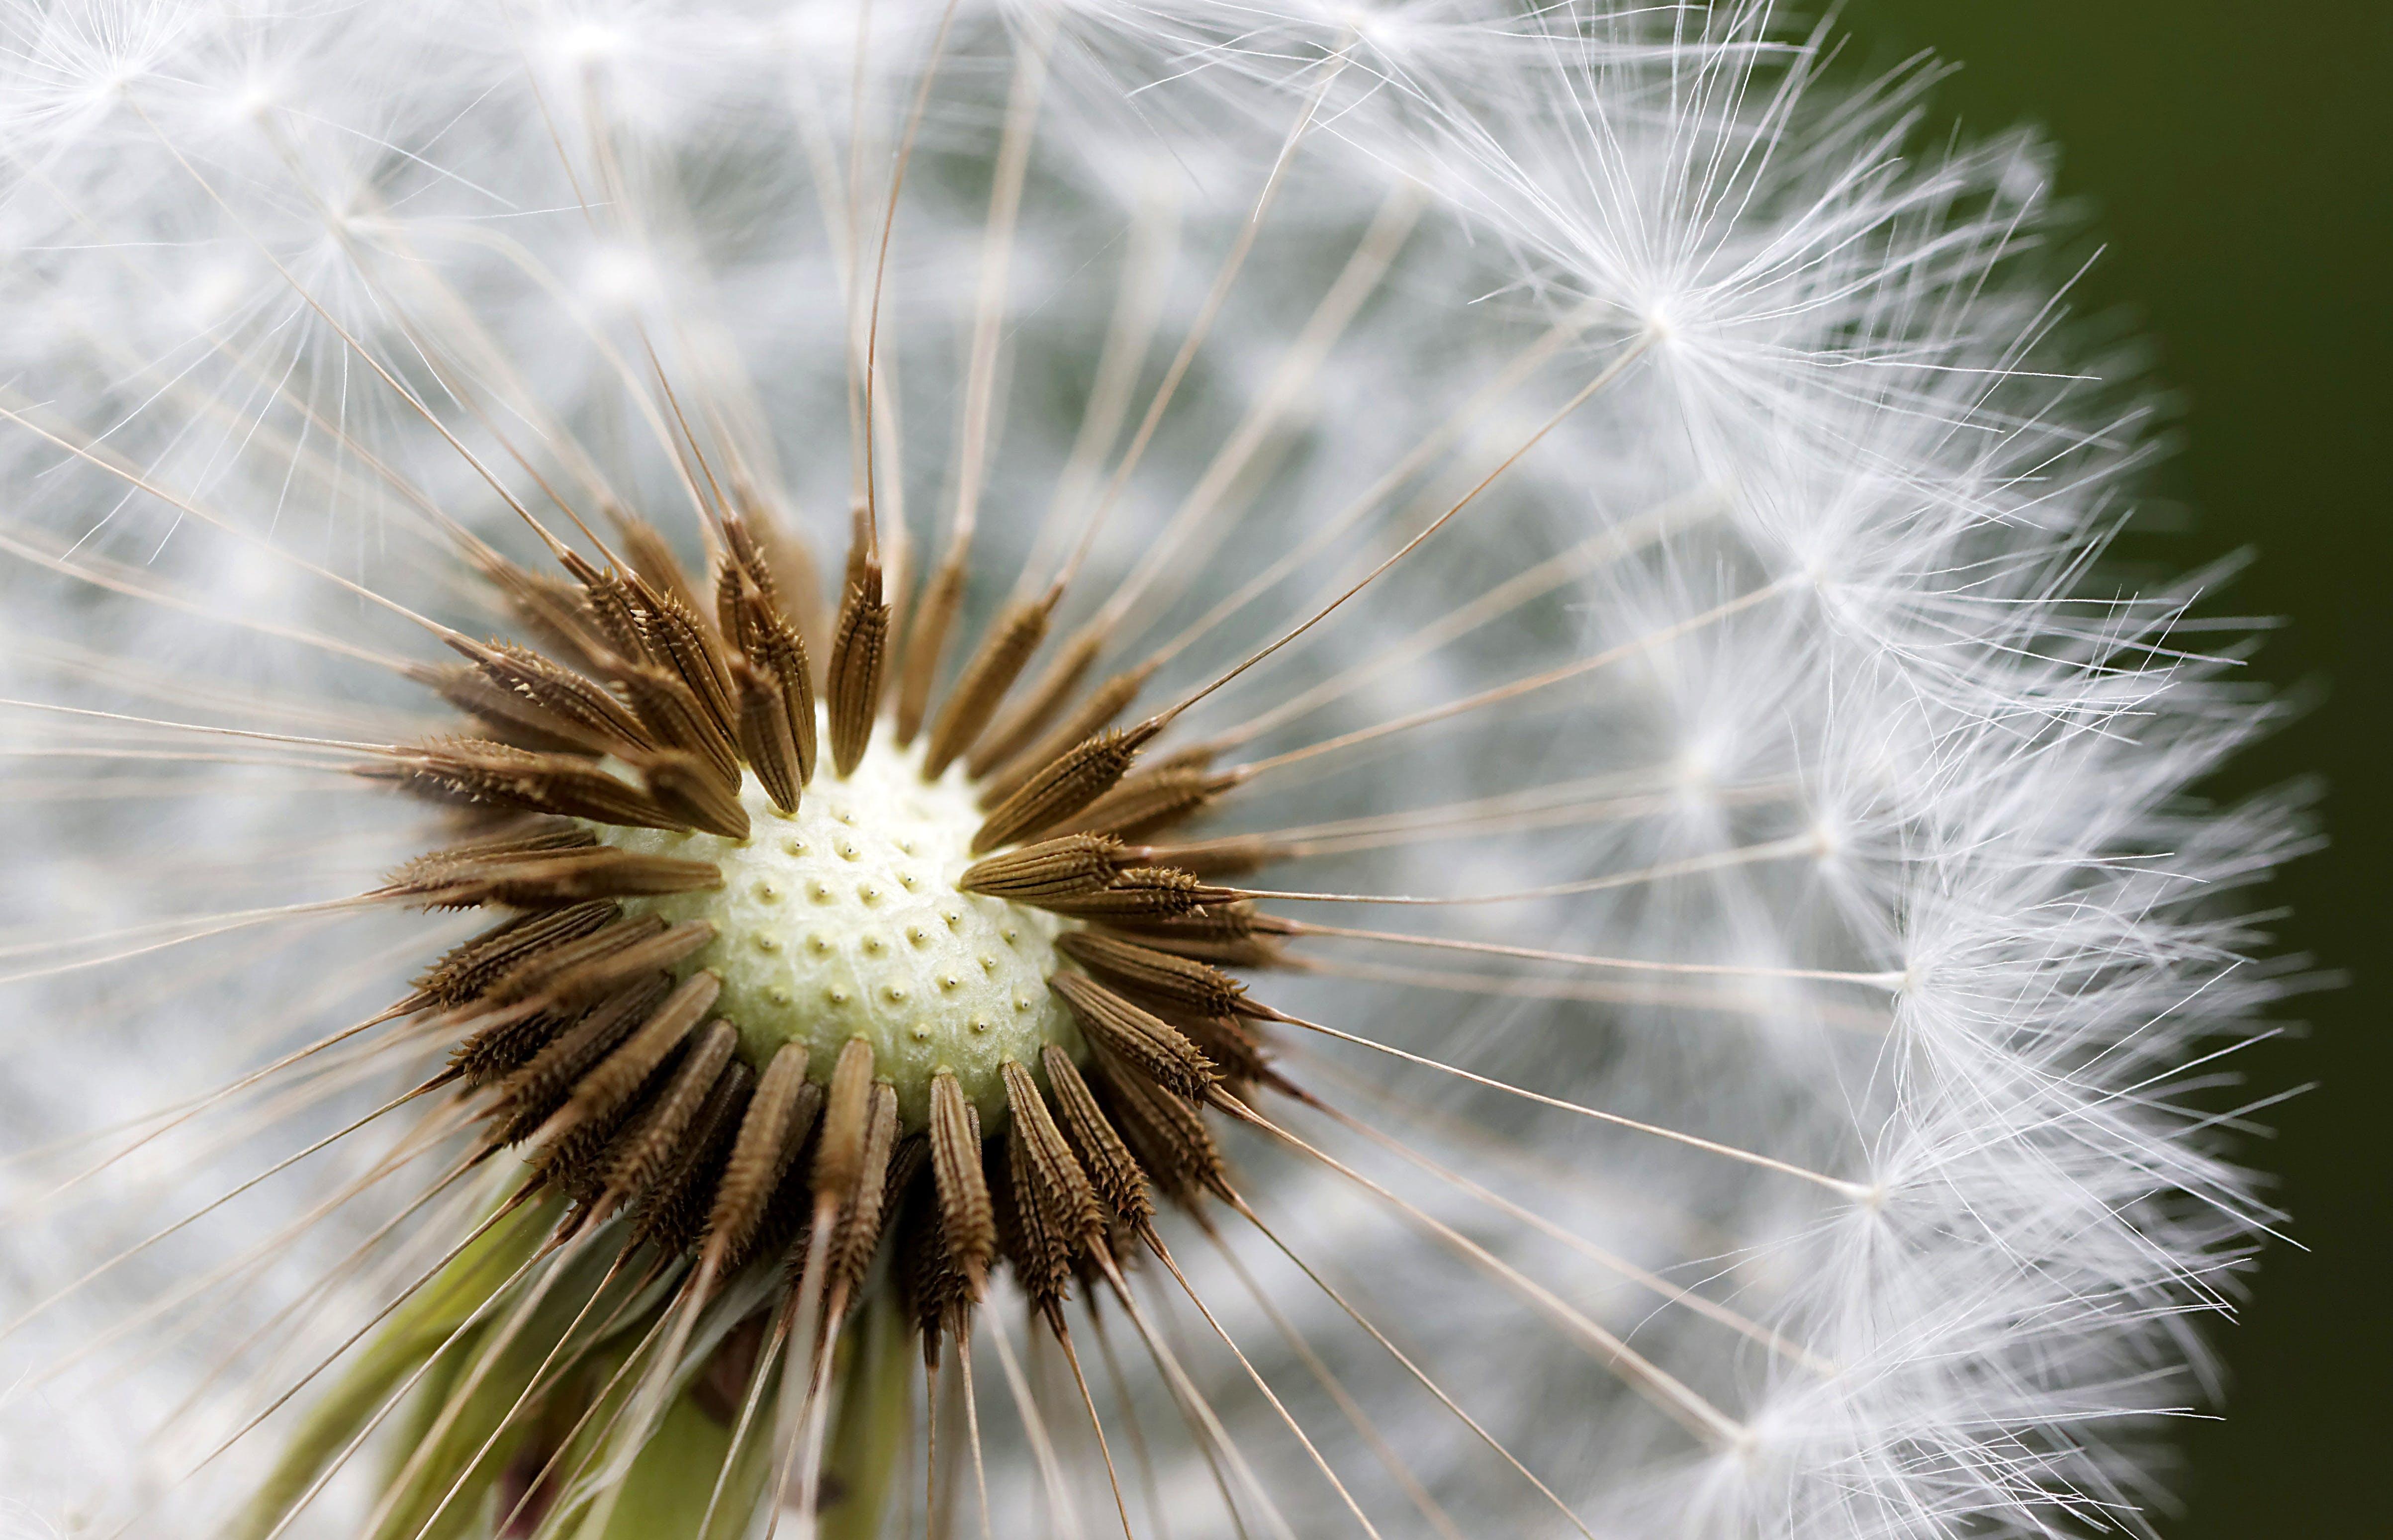 Kostenloses Stock Foto zu natur, pflanze, blume, makro